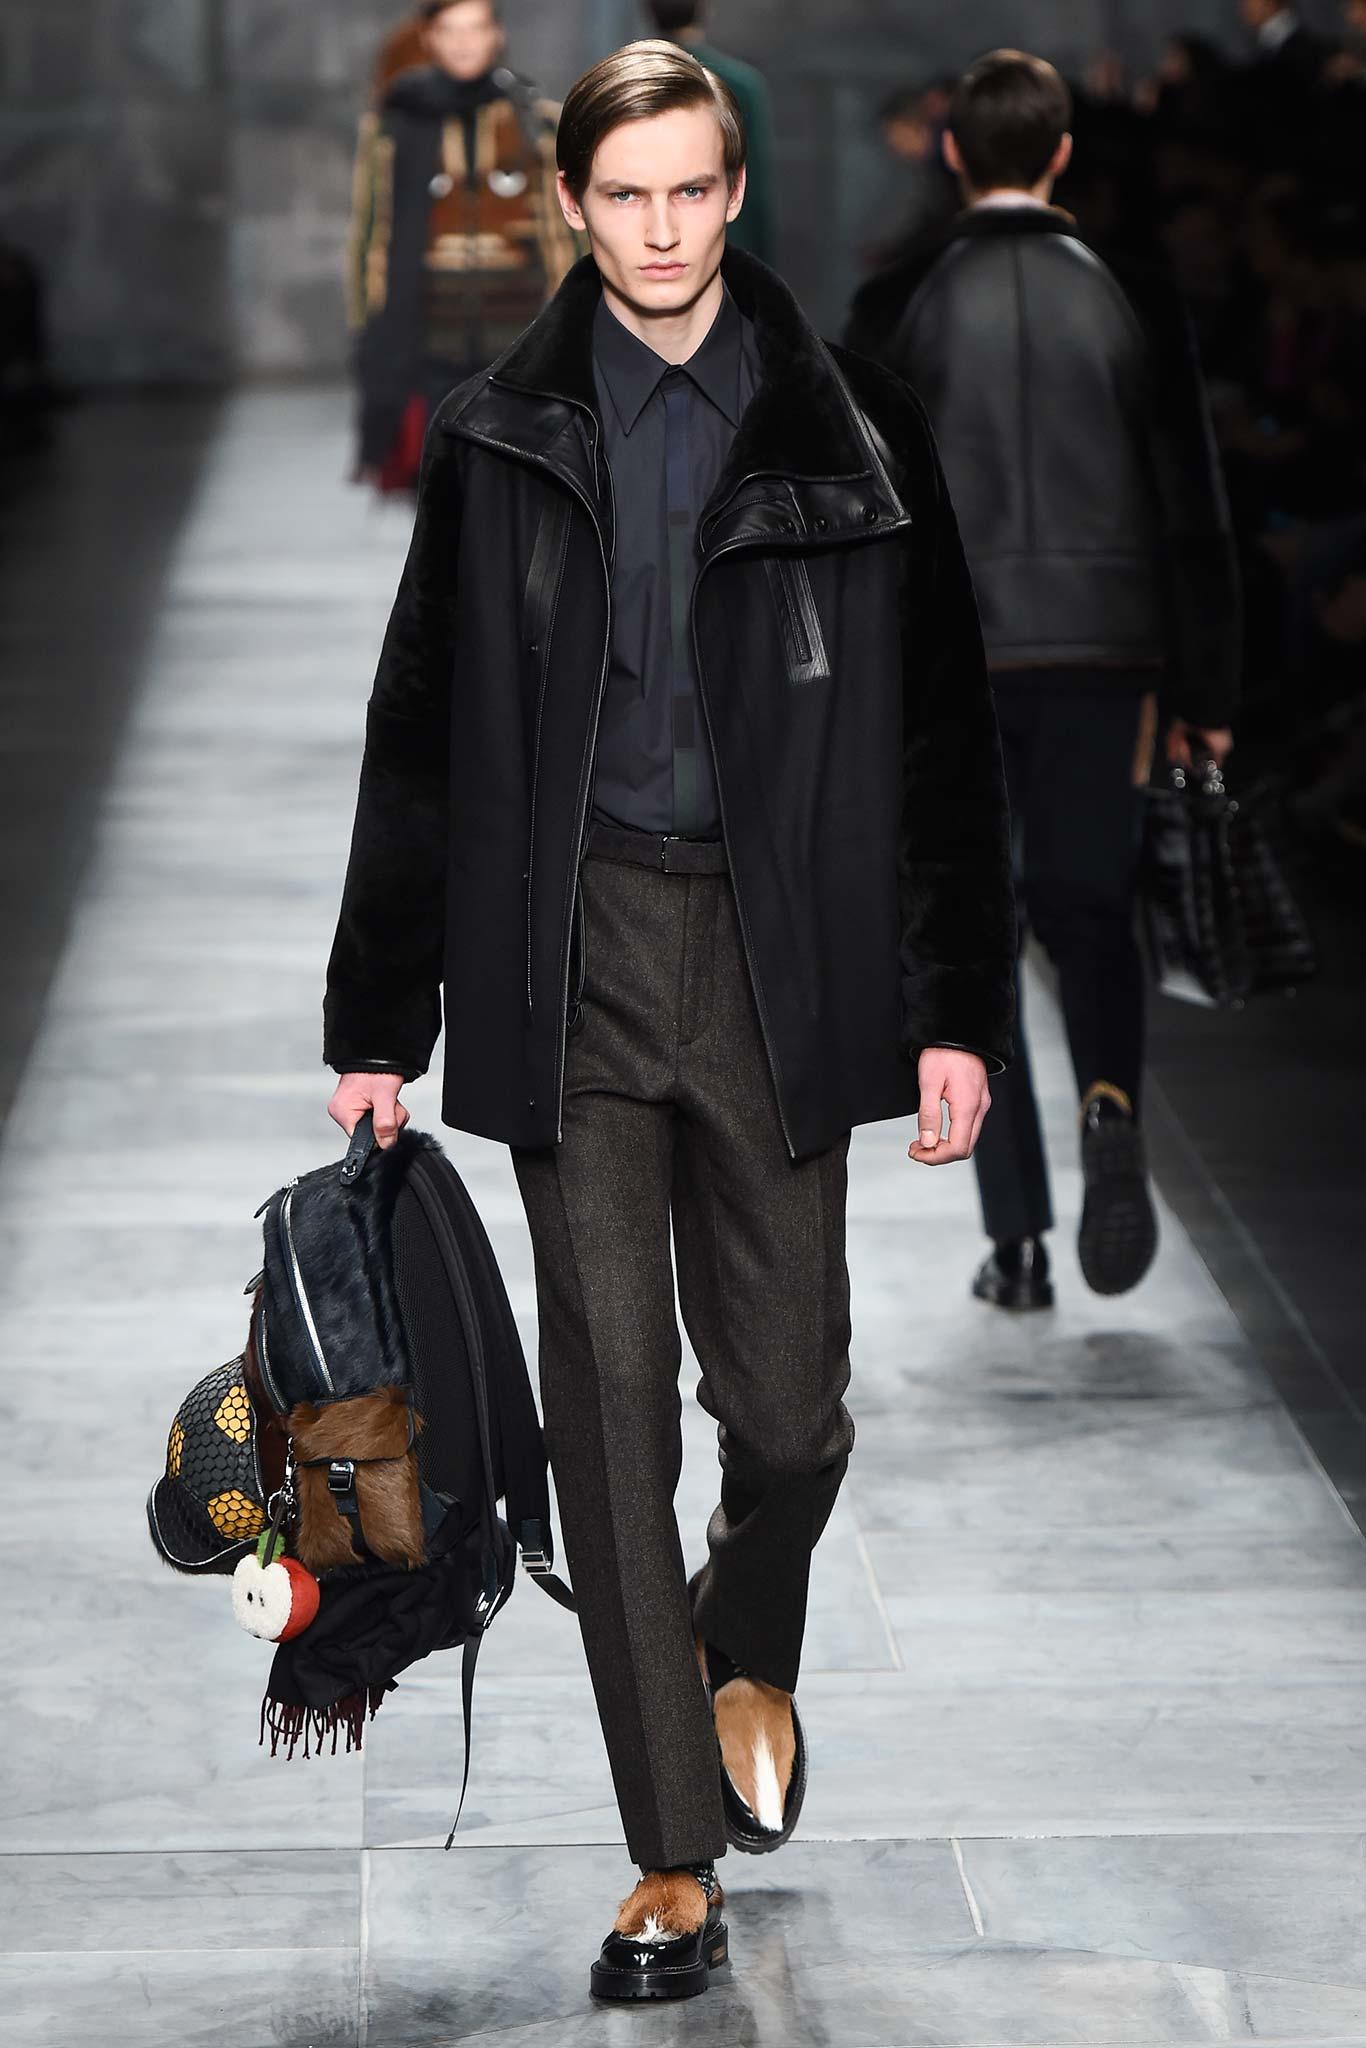 Fall fashions for men 84